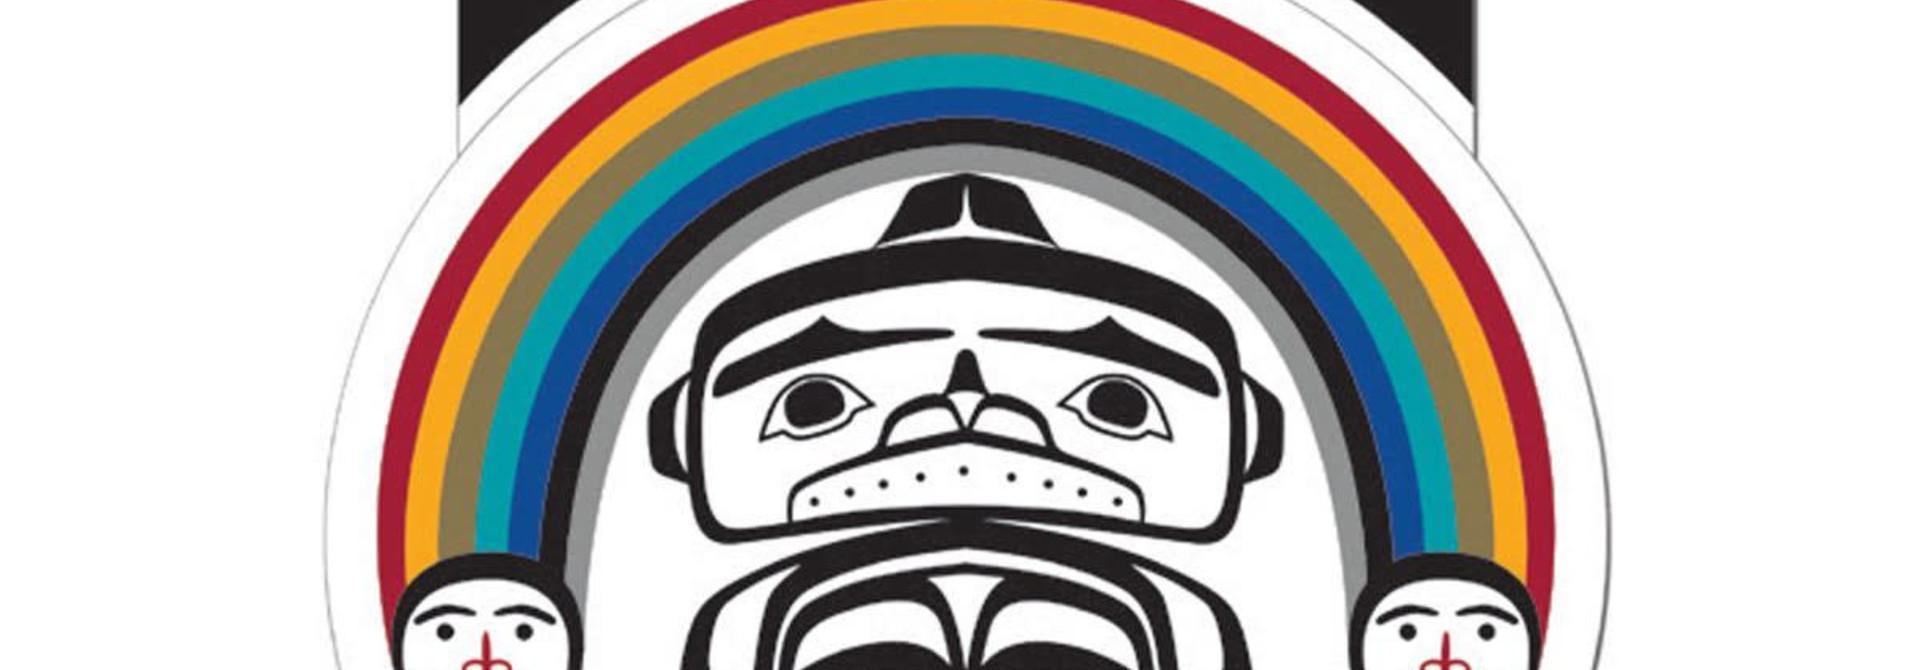 Premium Decal - Rainbow by Corey Bulpitt